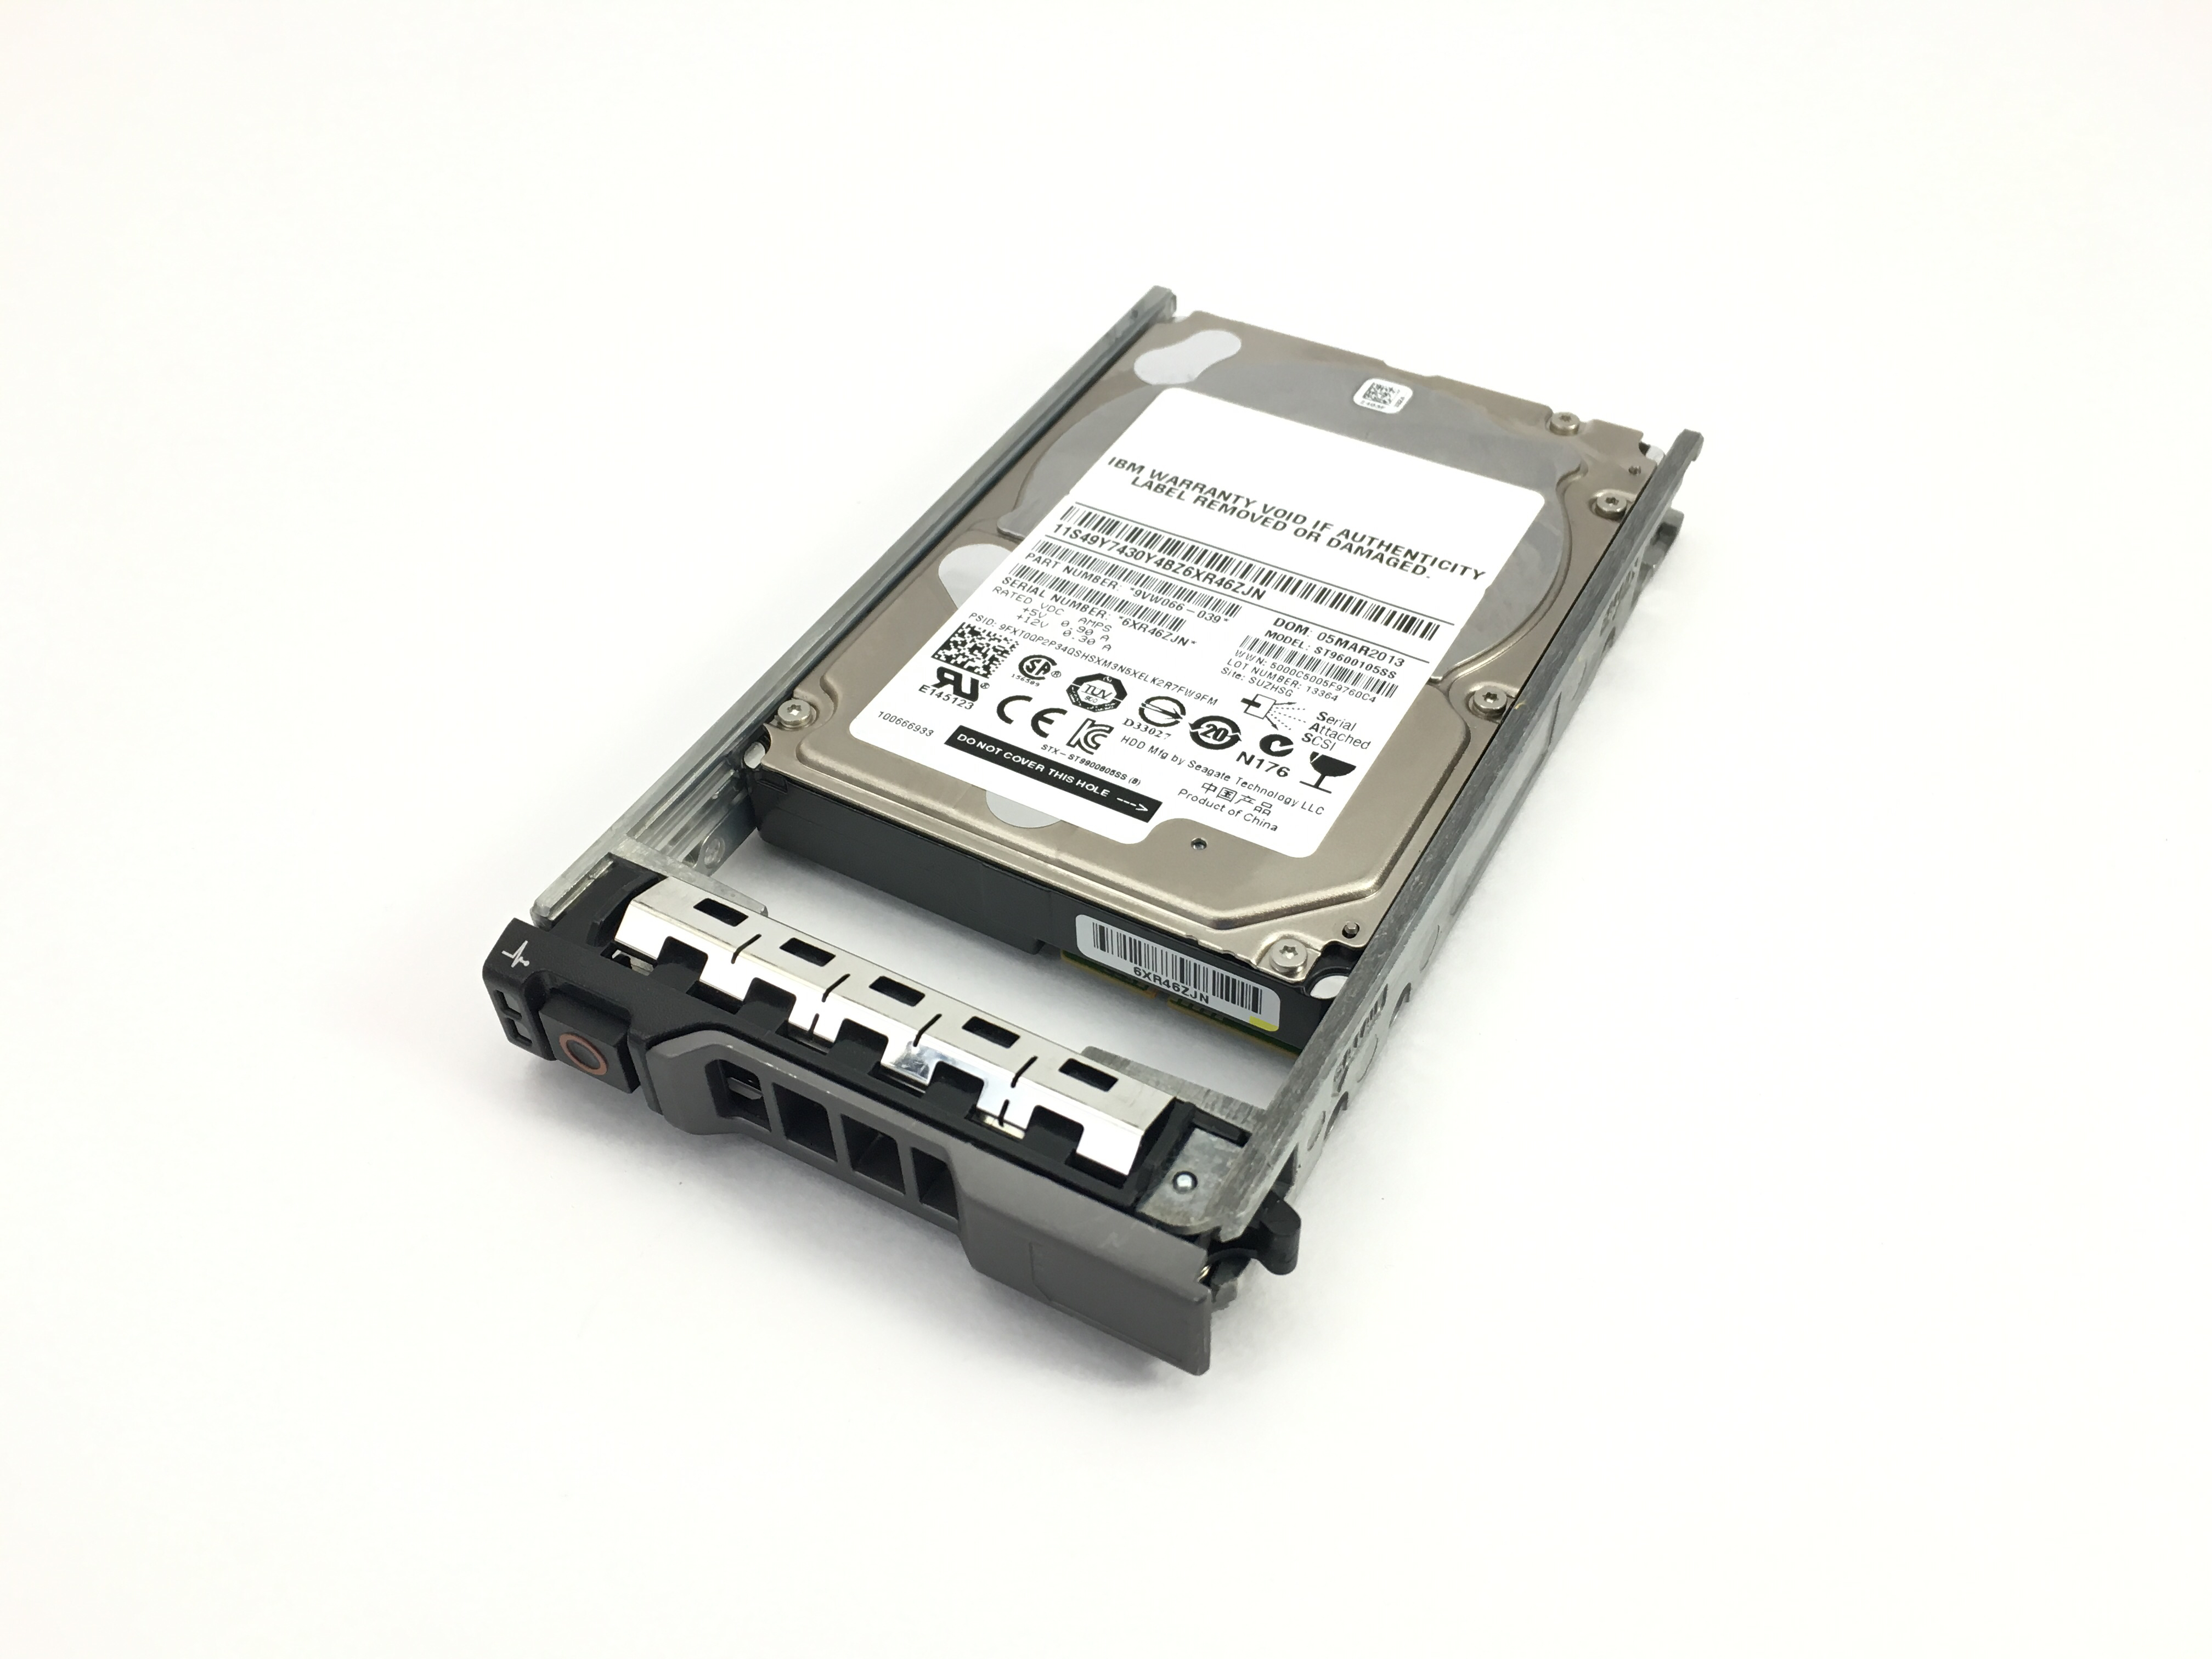 Details about 600GB 10K SAS 2 5